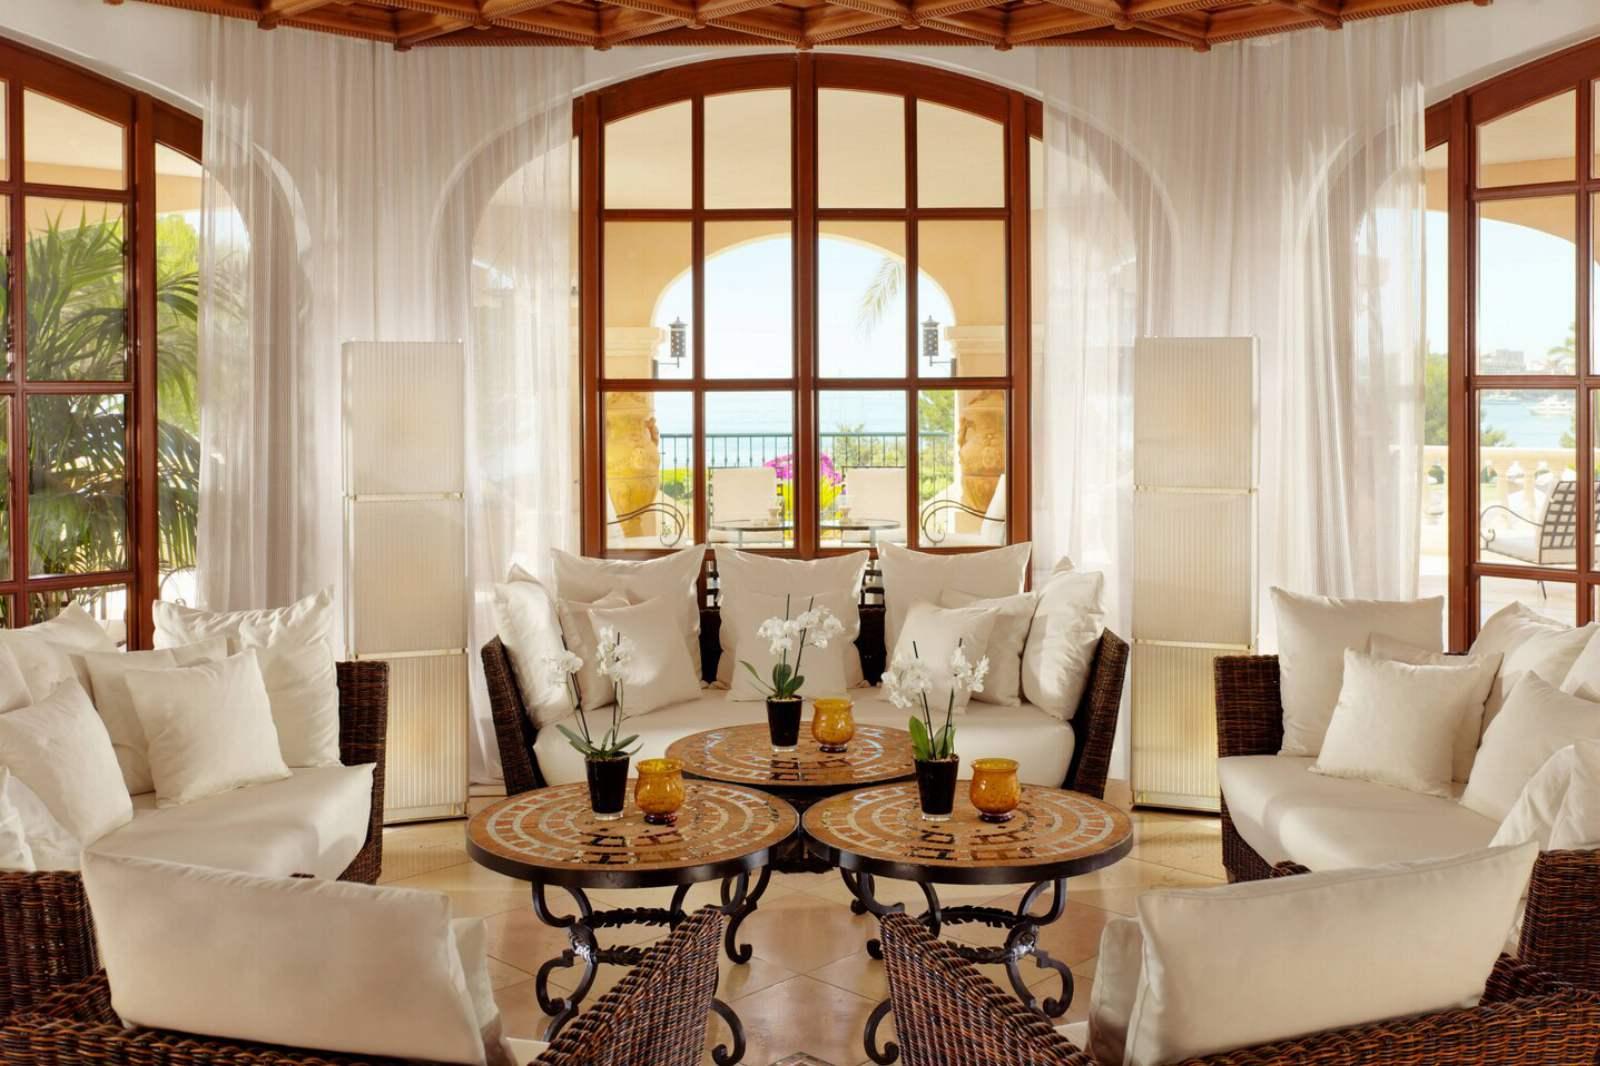 St. Regis Mardavall Resort - Moroccan Lounge